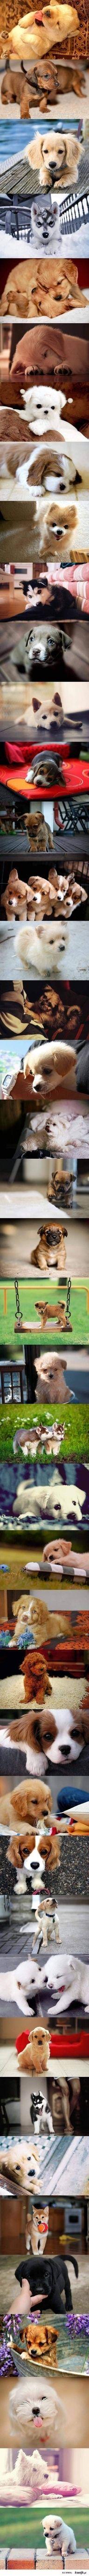 puppies, puppies!! I love puppies! :)